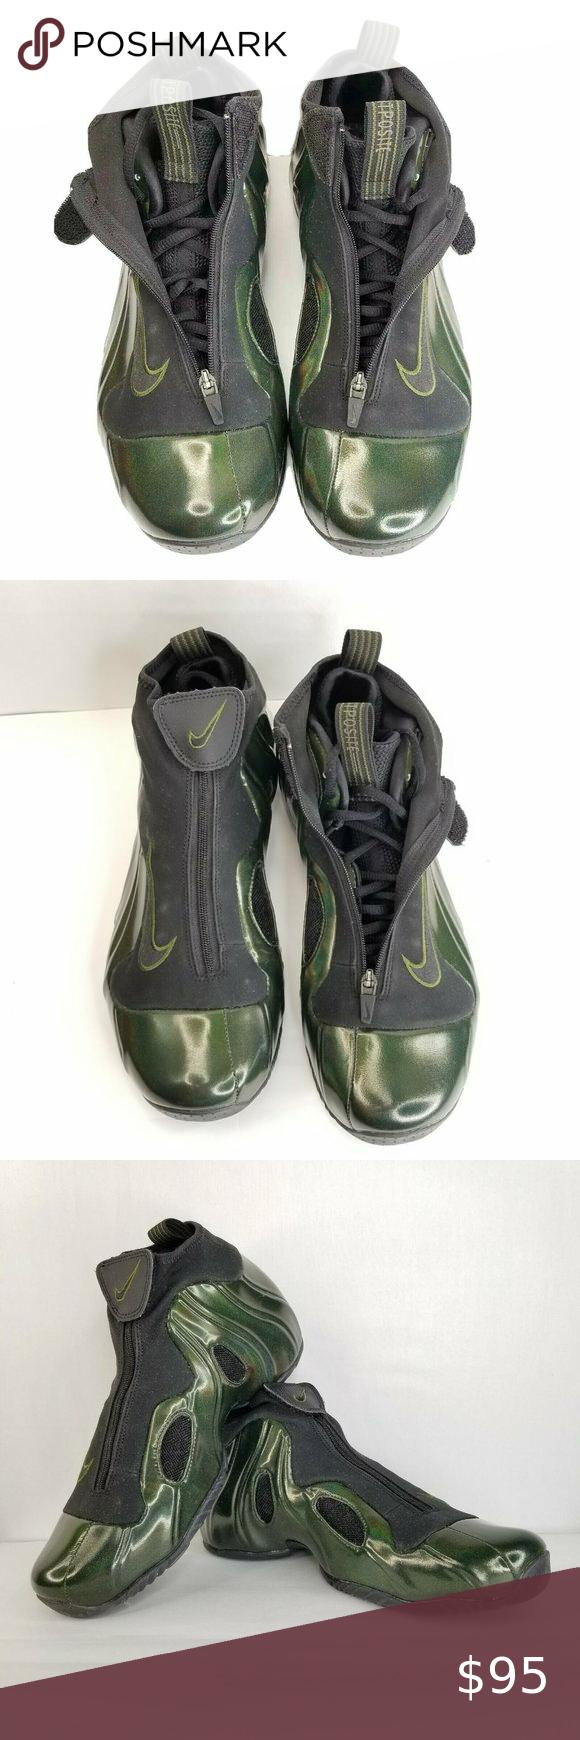 Nike AIR FLIGHTPOSITE Shoes Green